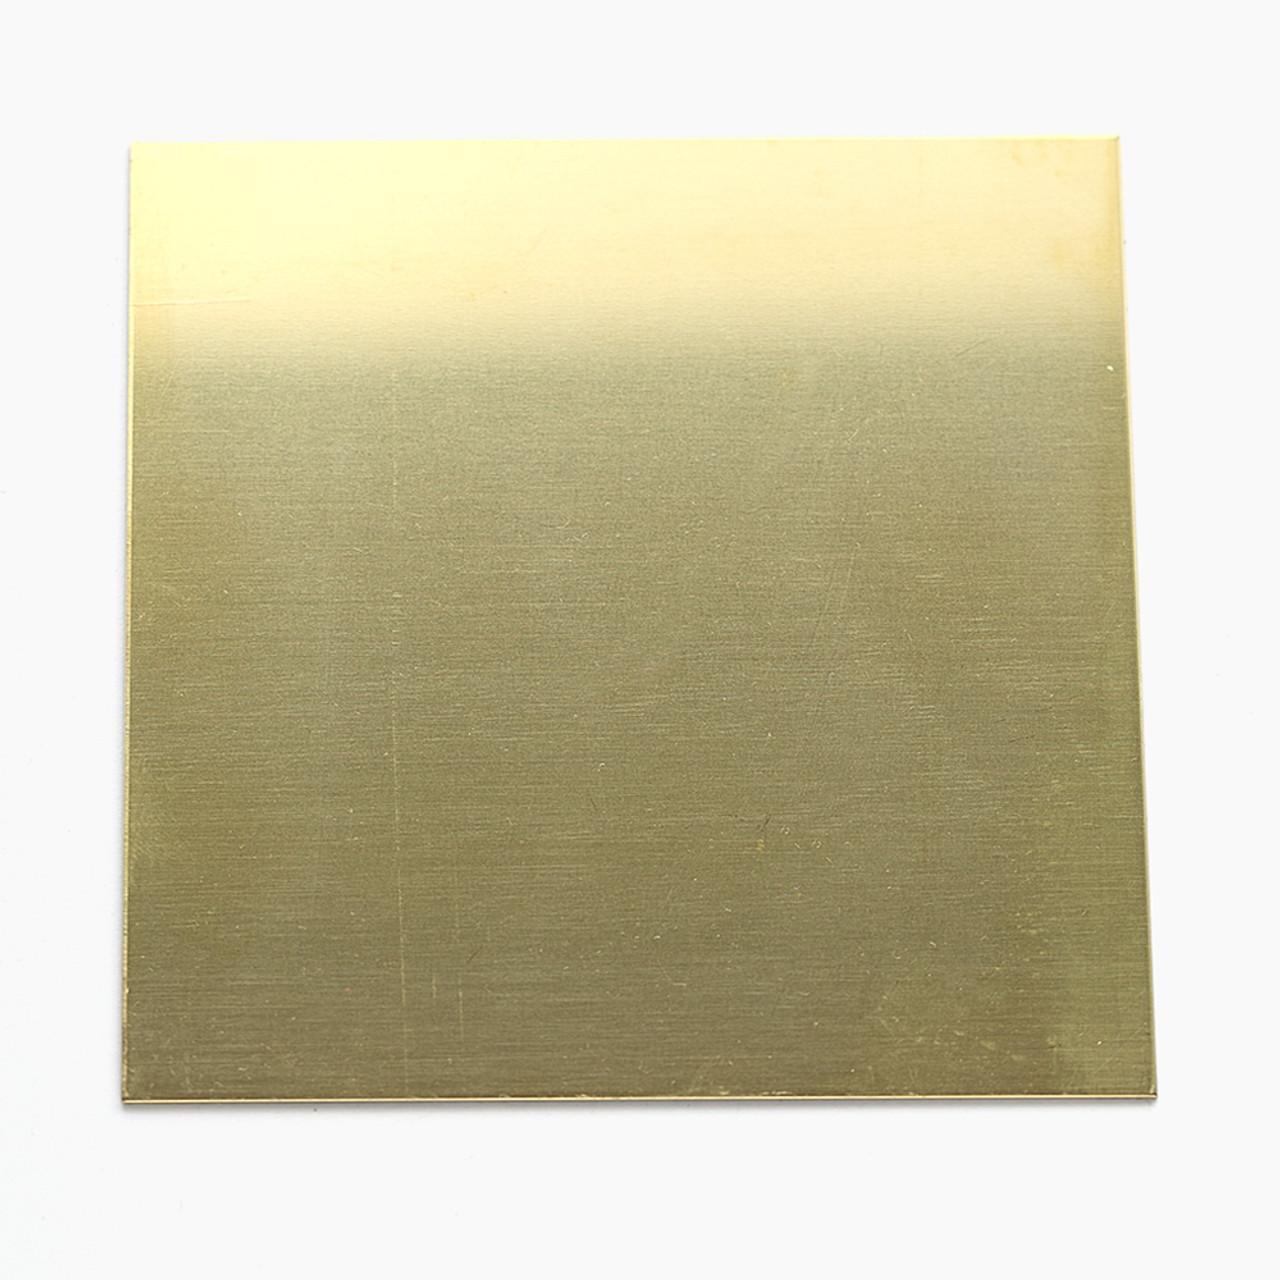 Square brass sheet